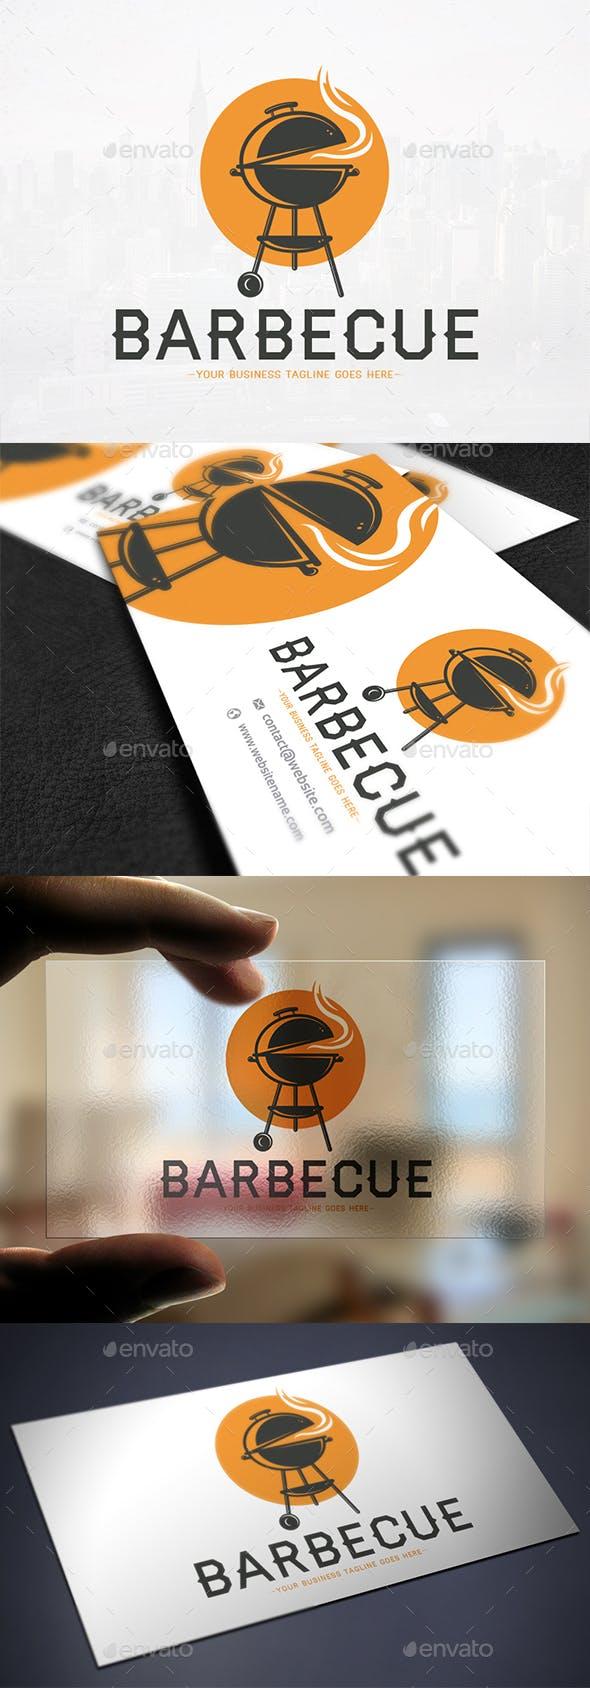 Barbecue Grill Logo Template